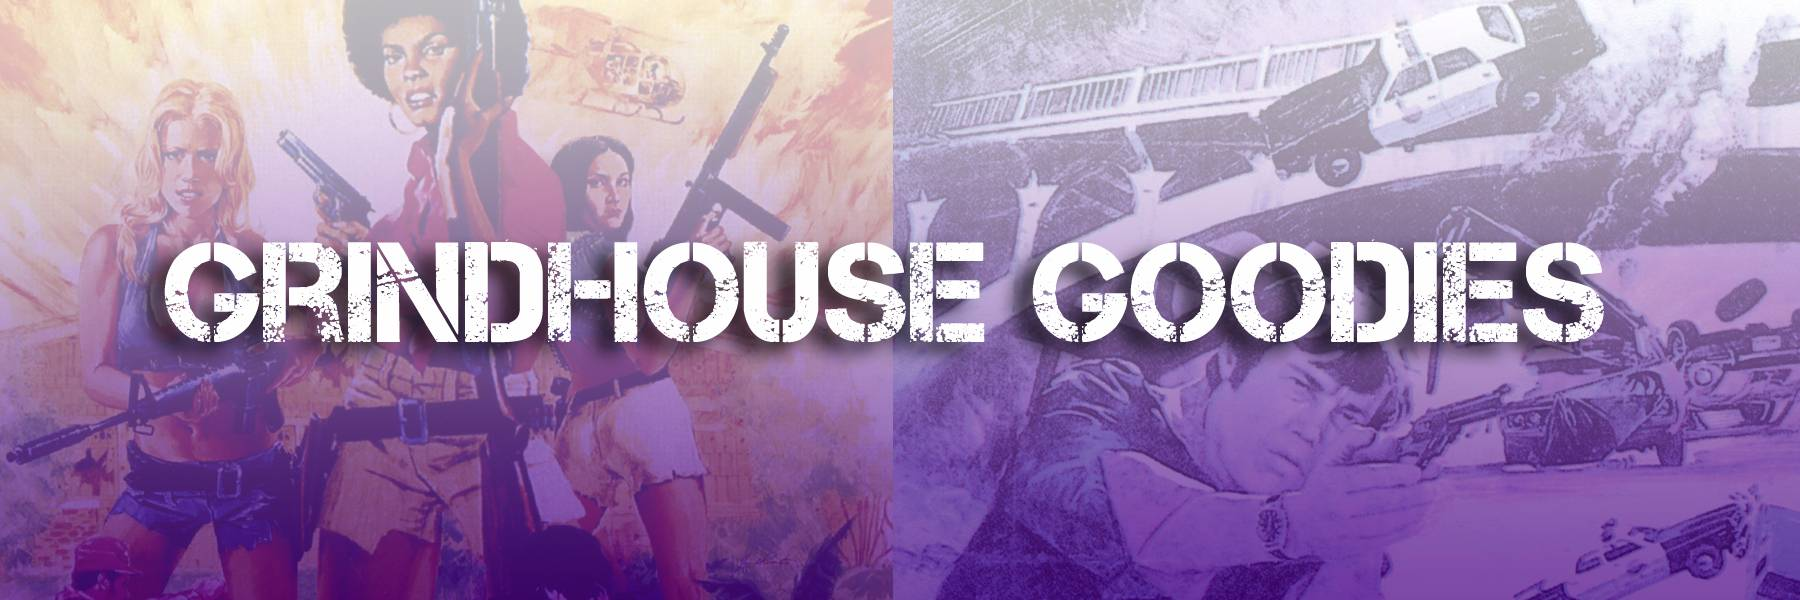 Grindhouse Goodies